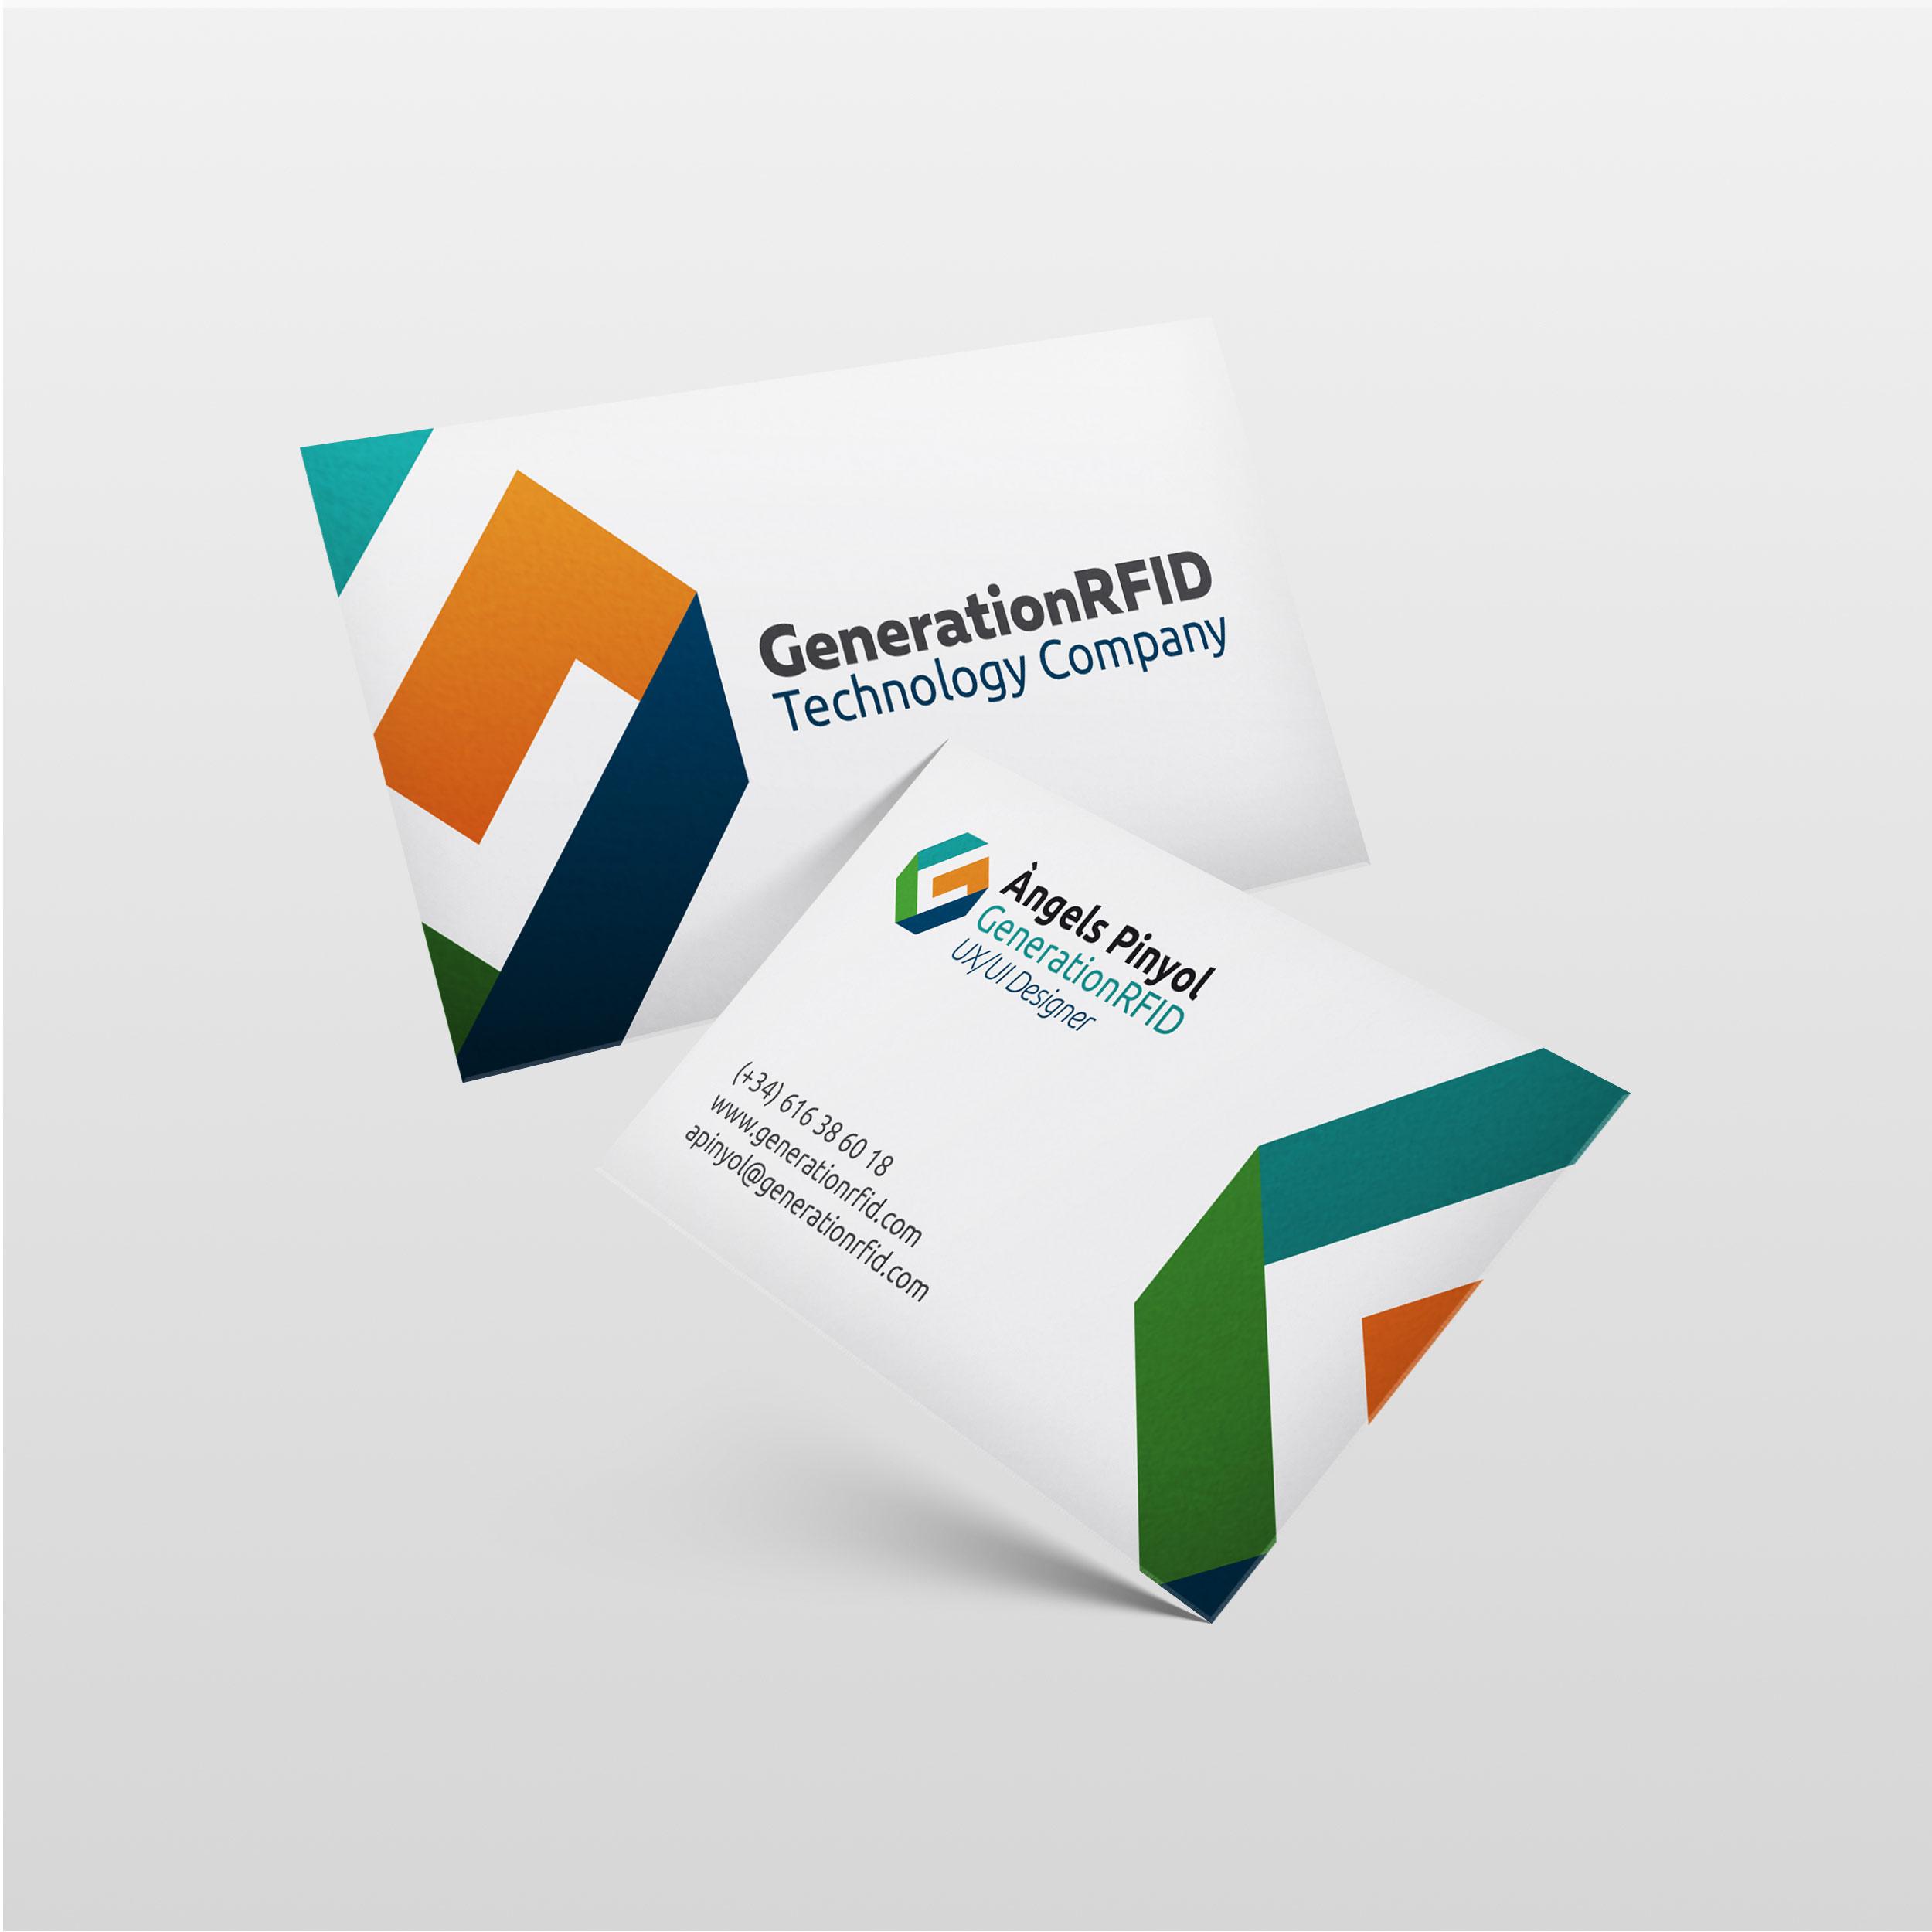 AngelsPinyol GraphicDesign UX UI Designer Reus Vilafranca Penedes - GENERATION - Branding per empresa tecnològica